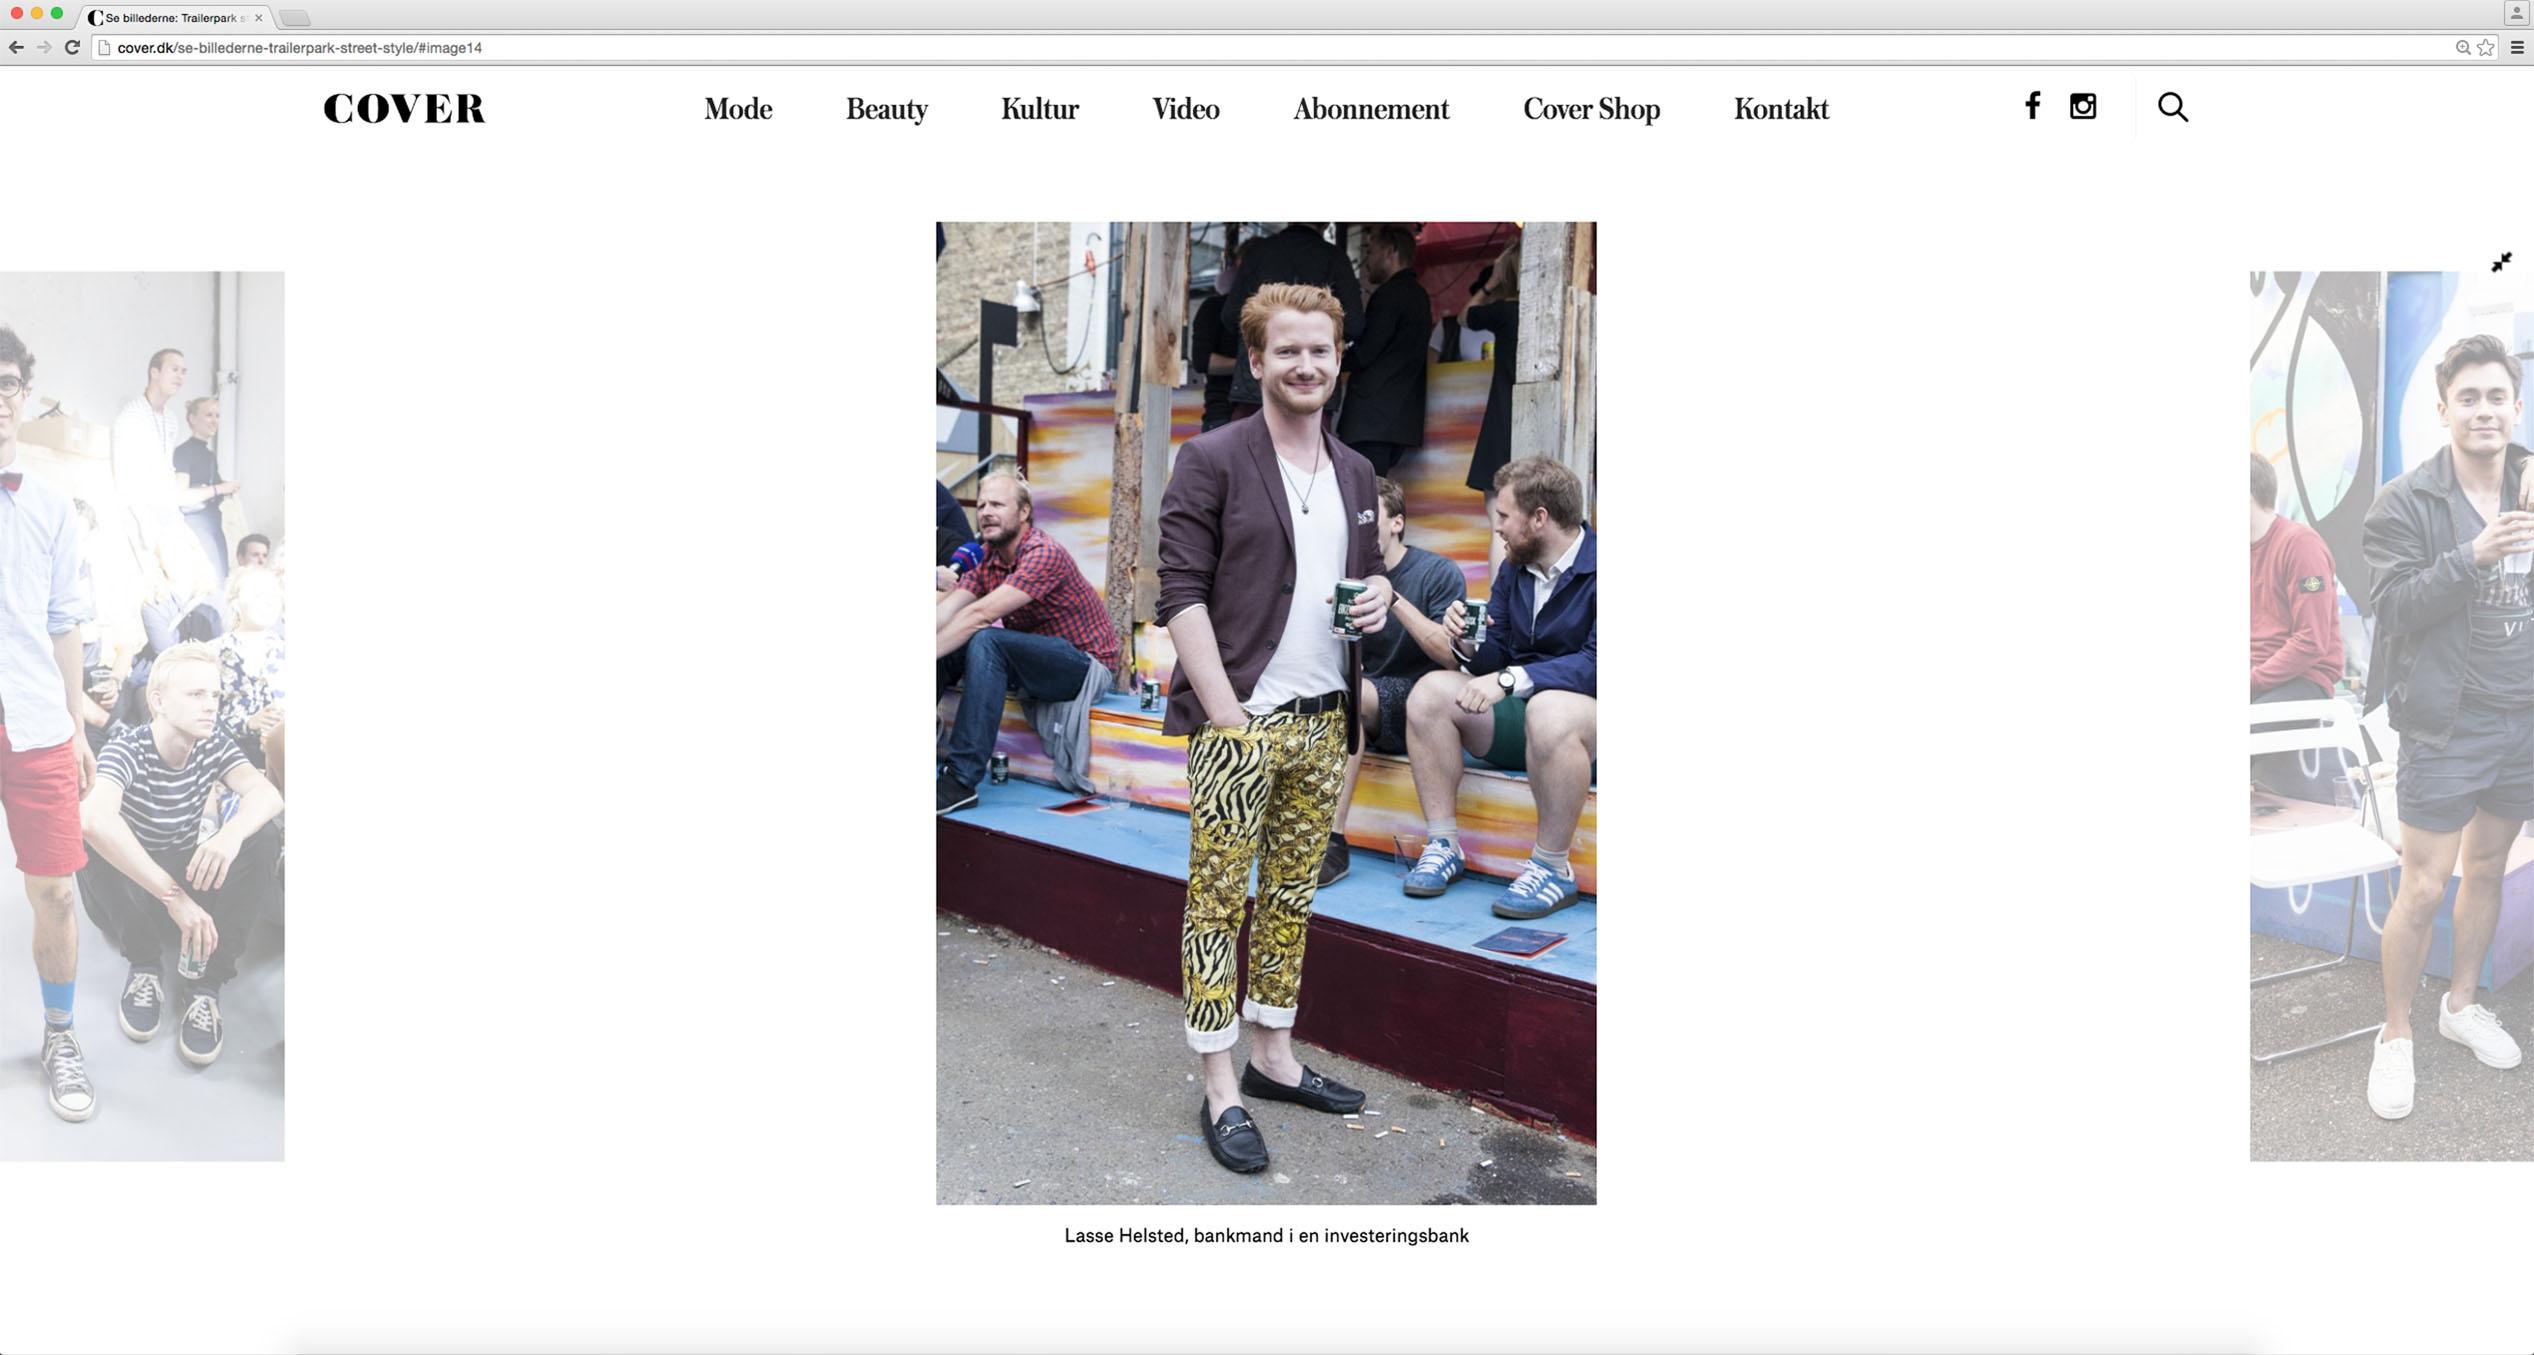 Streetstyle_CoverMagazine_TrailerparkFestival2016_14